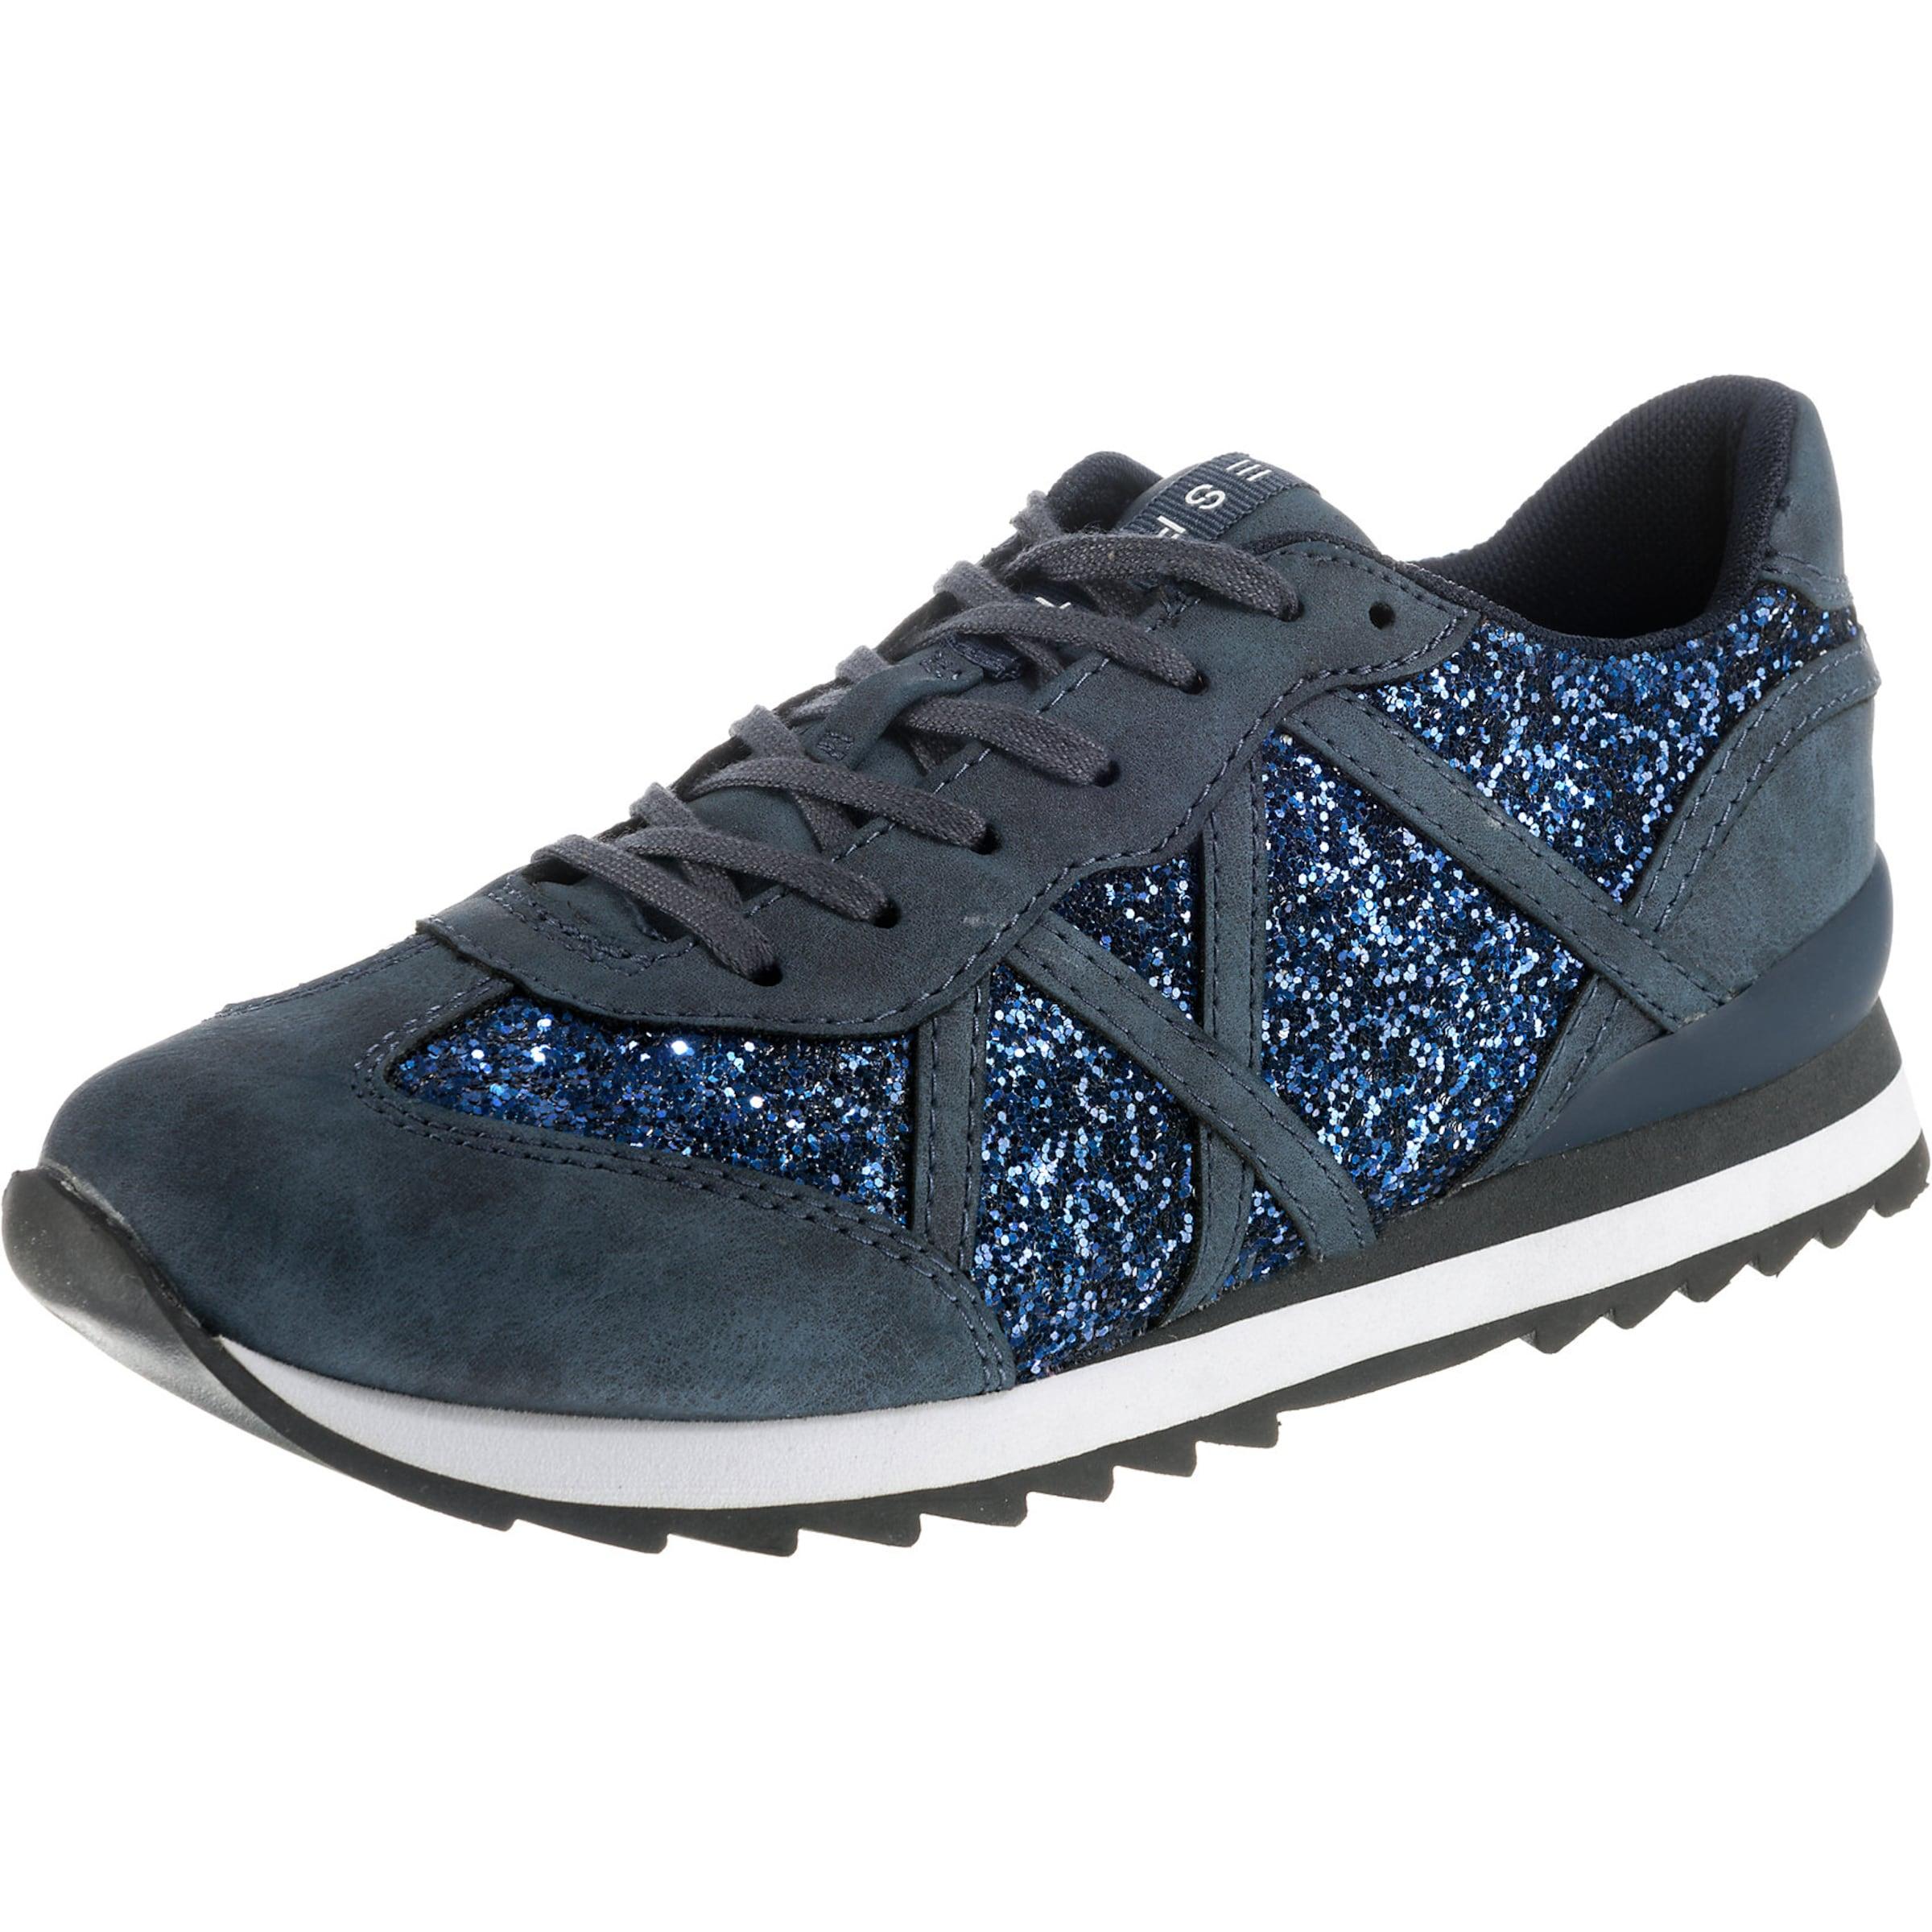 ESPRIT Sneakers  Astro Glitt LU